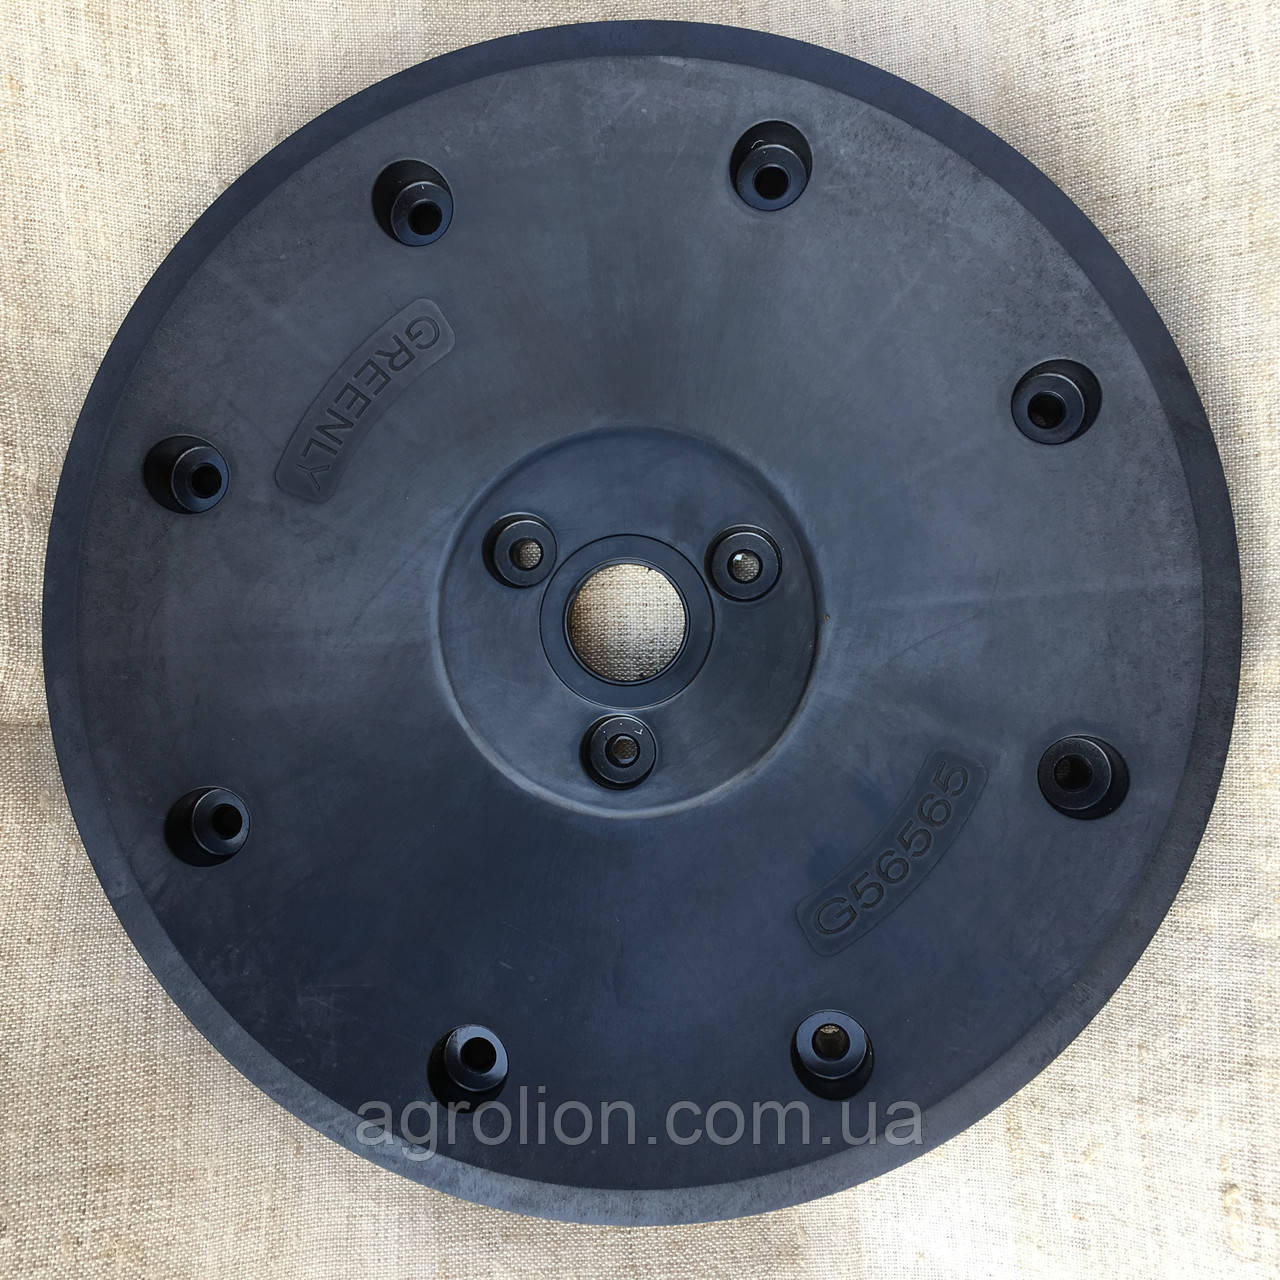 "Напівдиск колеса опорного 4,5"" x 16""  A56565 диск  пластмас"